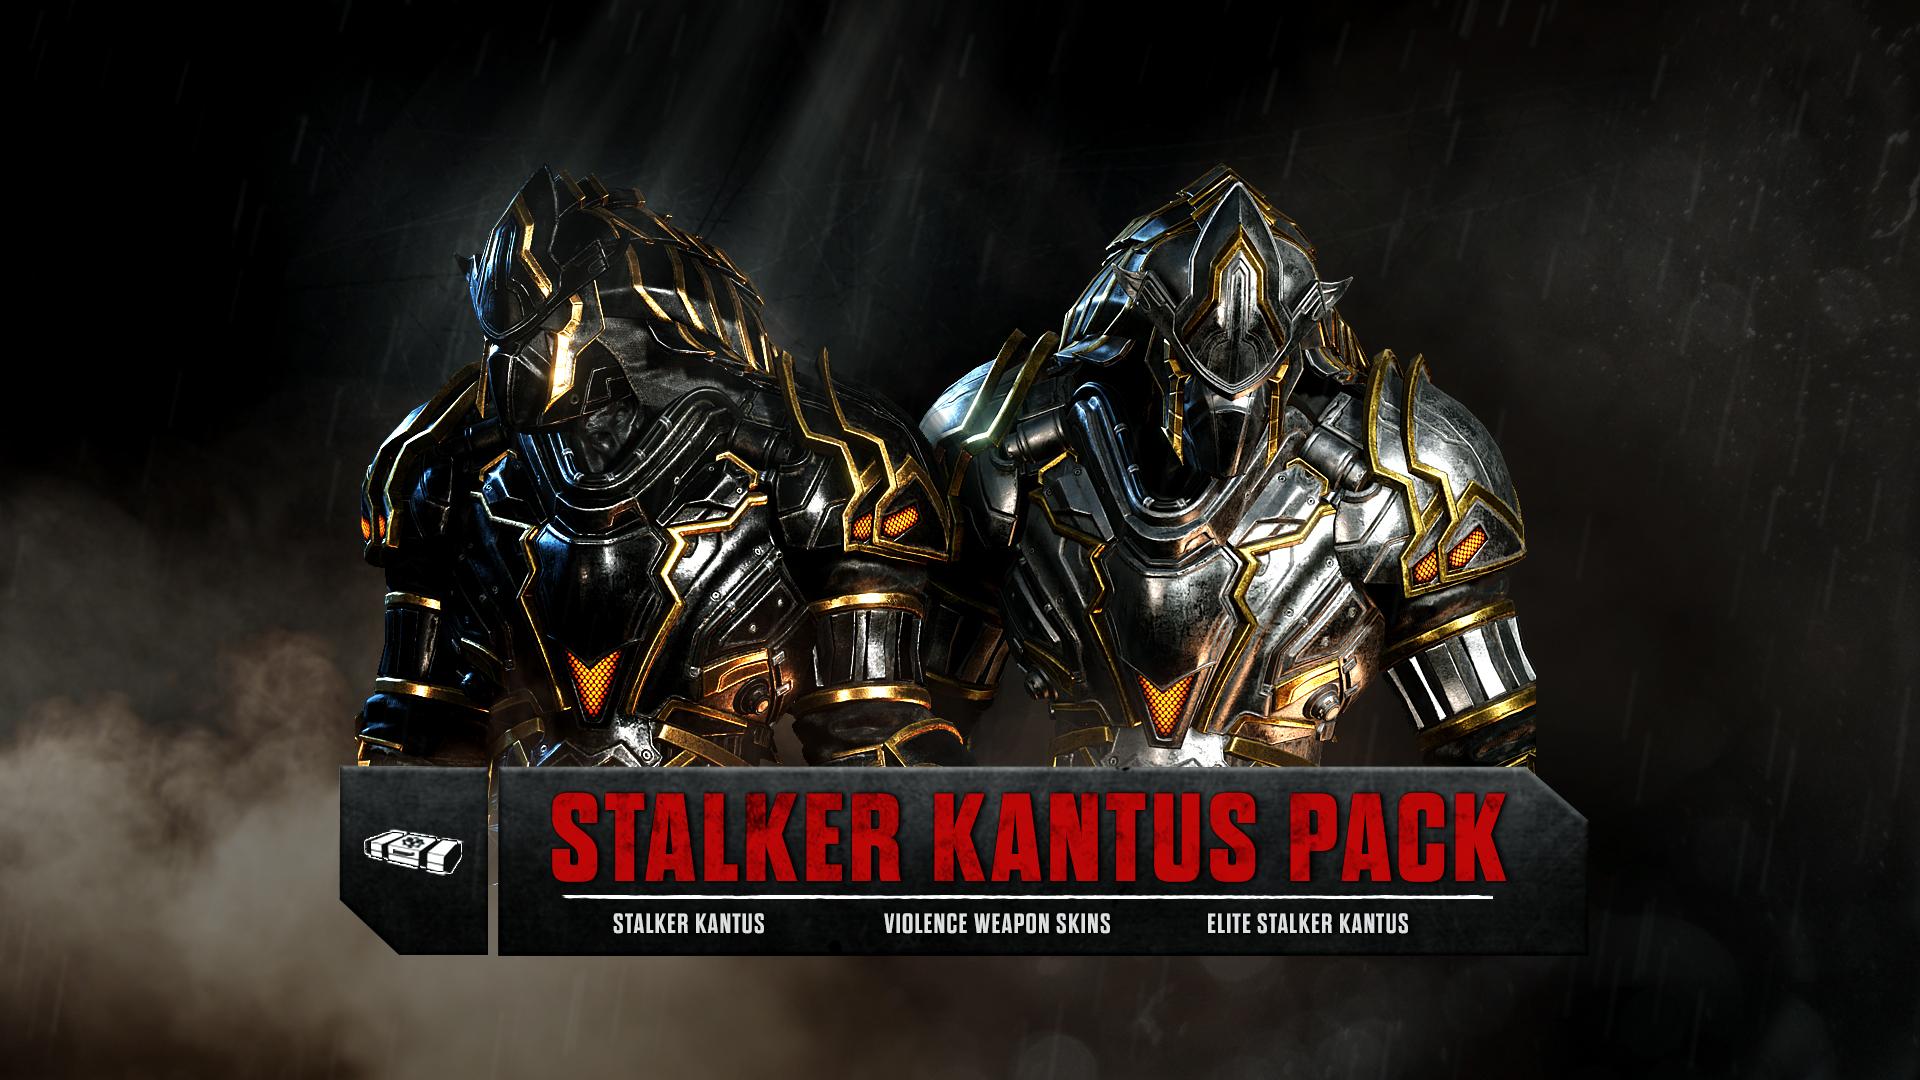 stalkerkantus_1080-ead5c352b8ab4d19a2106